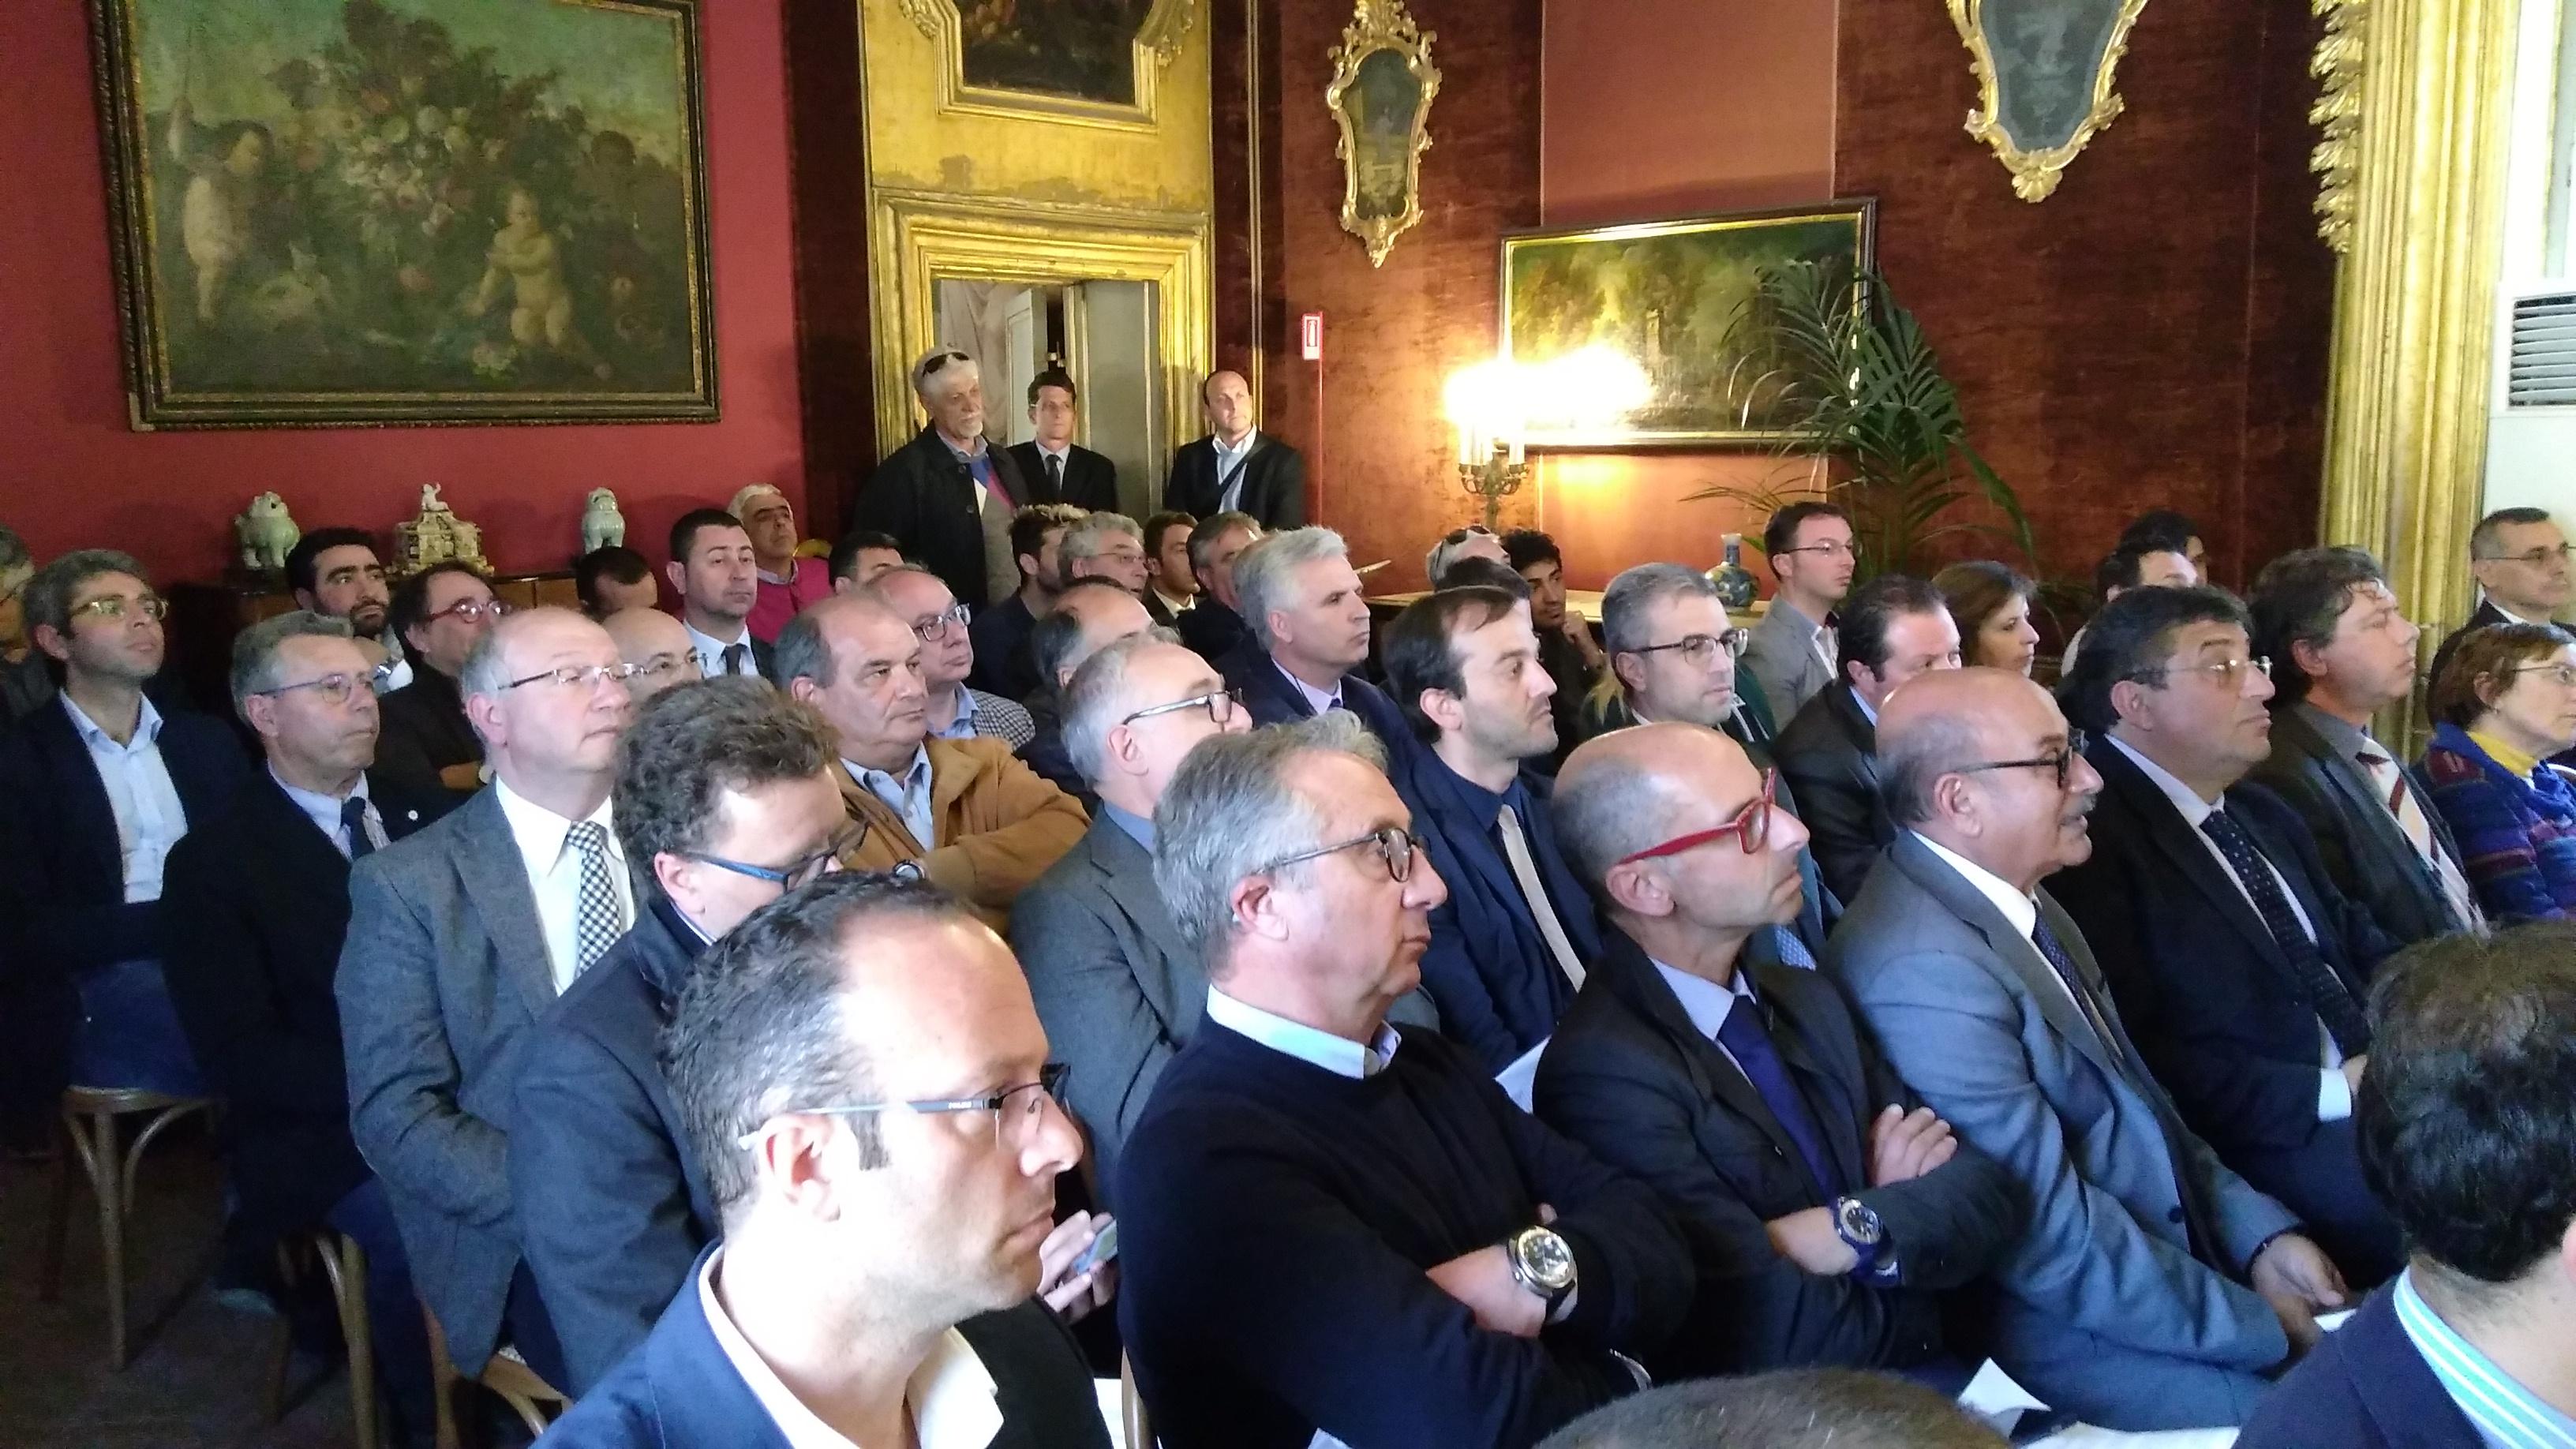 Sicilia: sindaci contro norma decadenza, pronta impugnativa